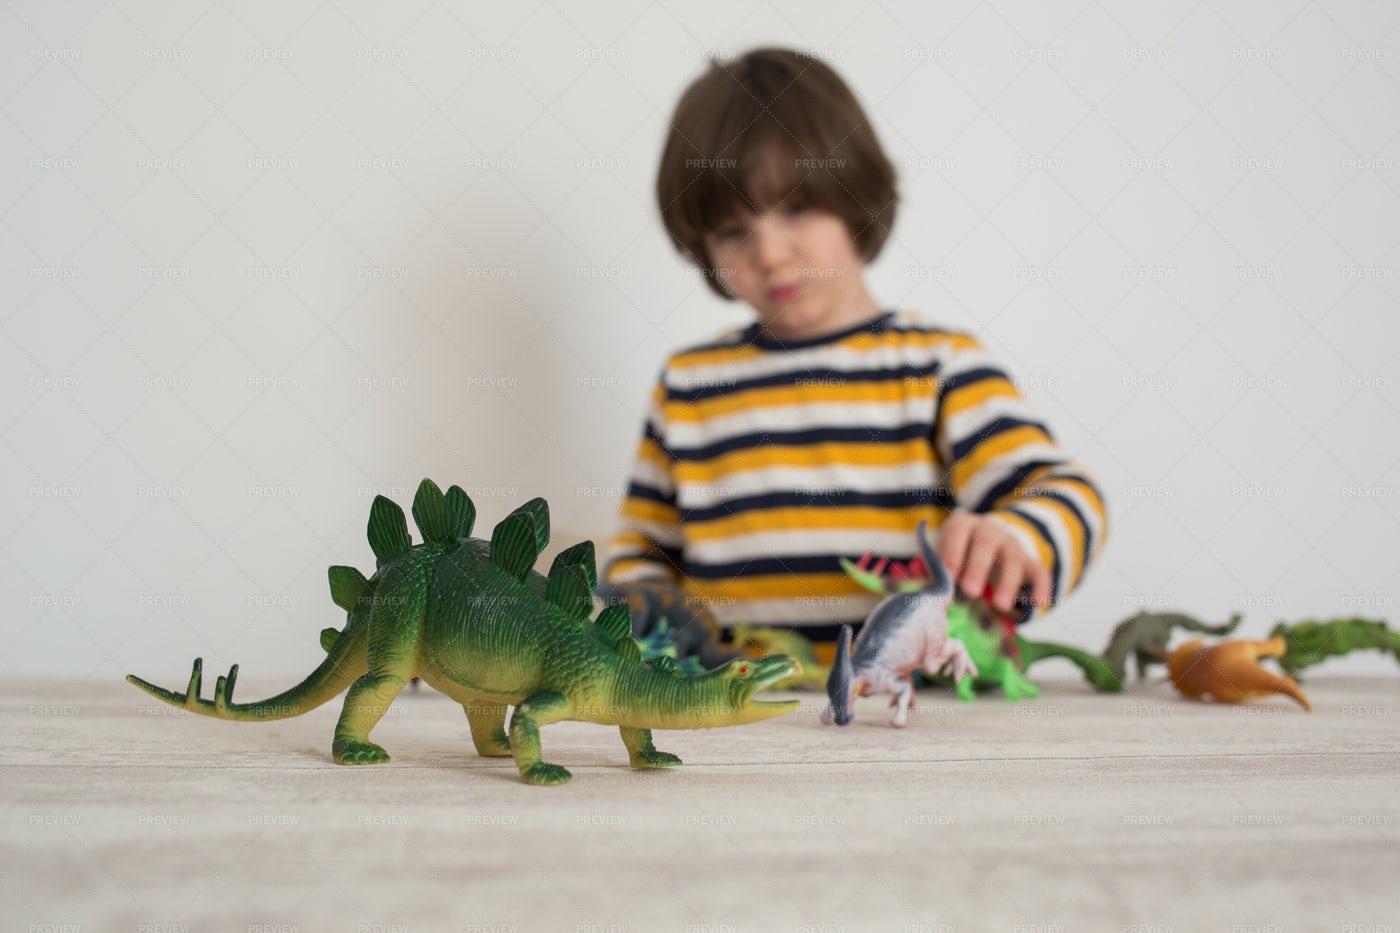 Boy Plays With Dinosaurs: Stock Photos